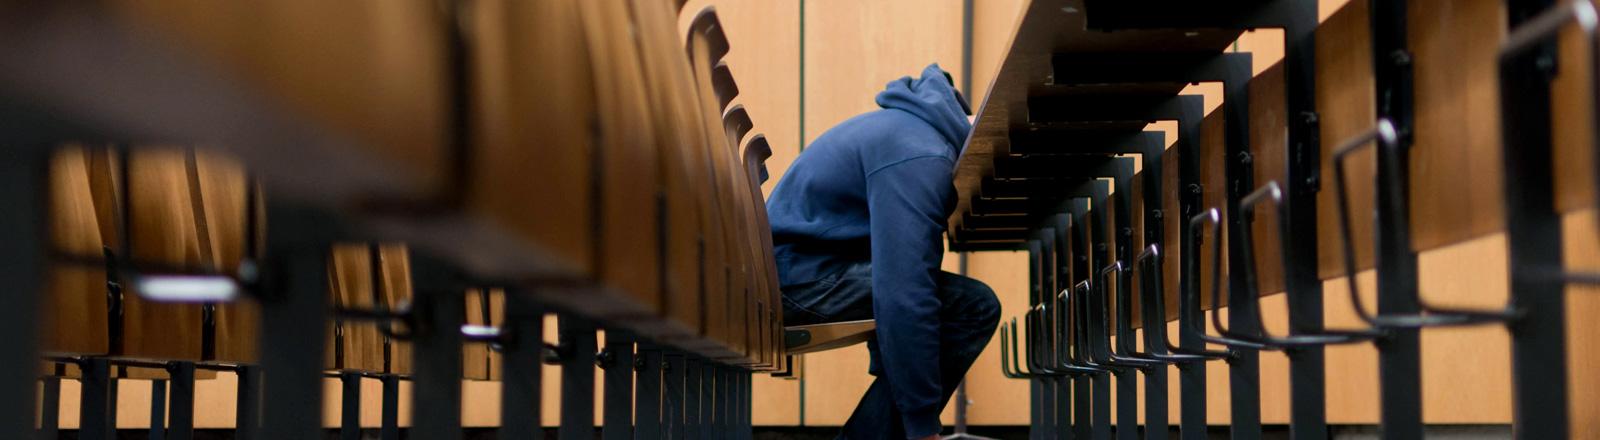 Verzweifelter Student im Hörsaal